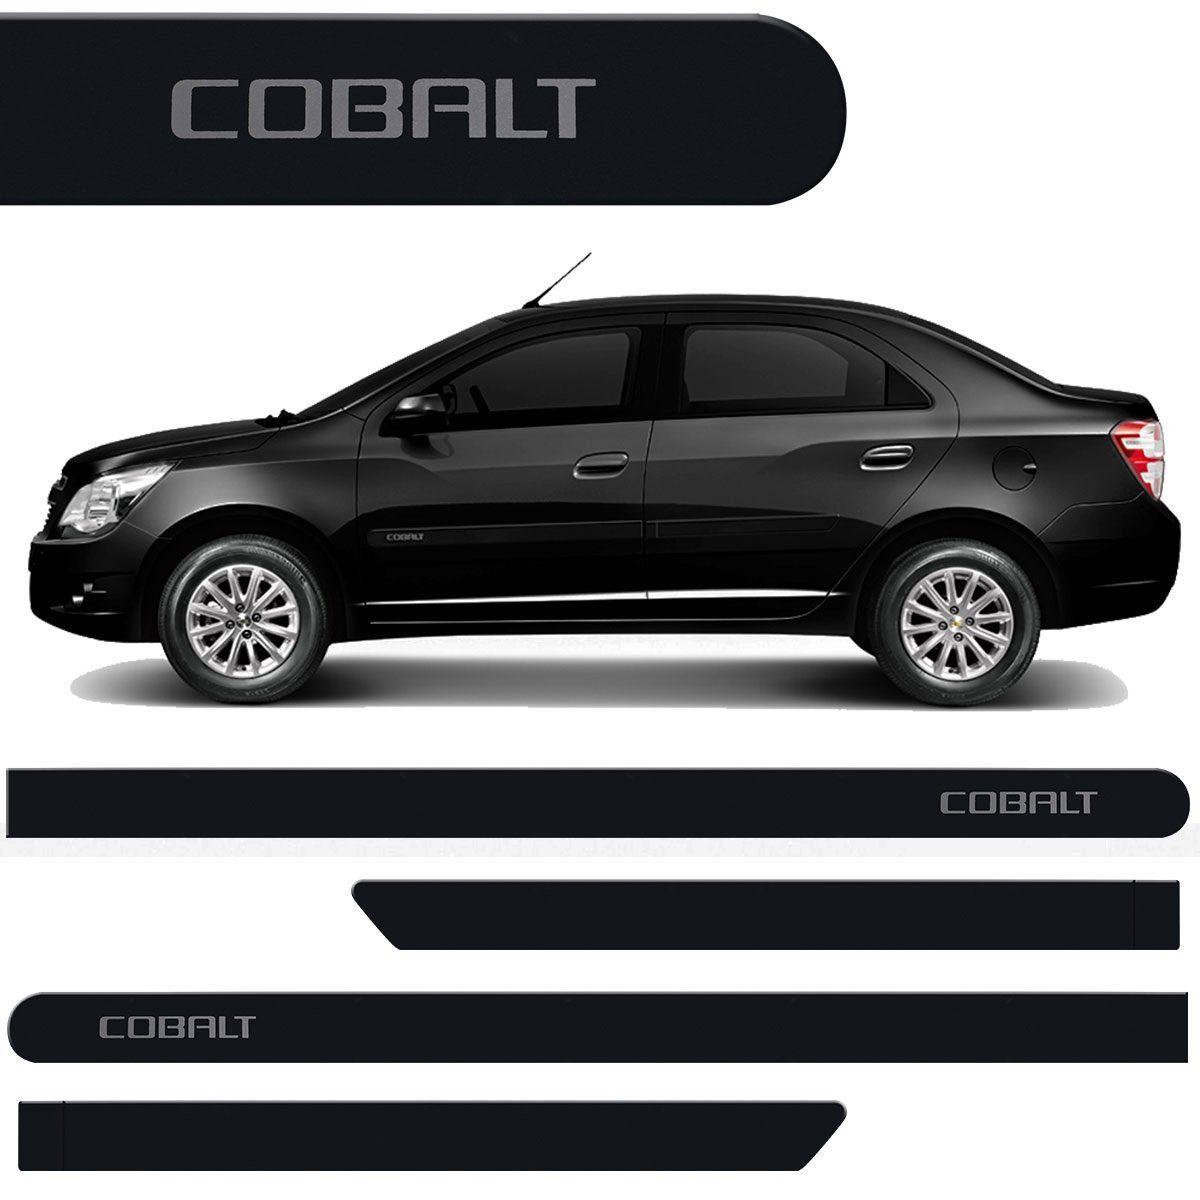 Jogo Friso Lateral Cobalt 2012 2013 2014 2015 Preto Carbon